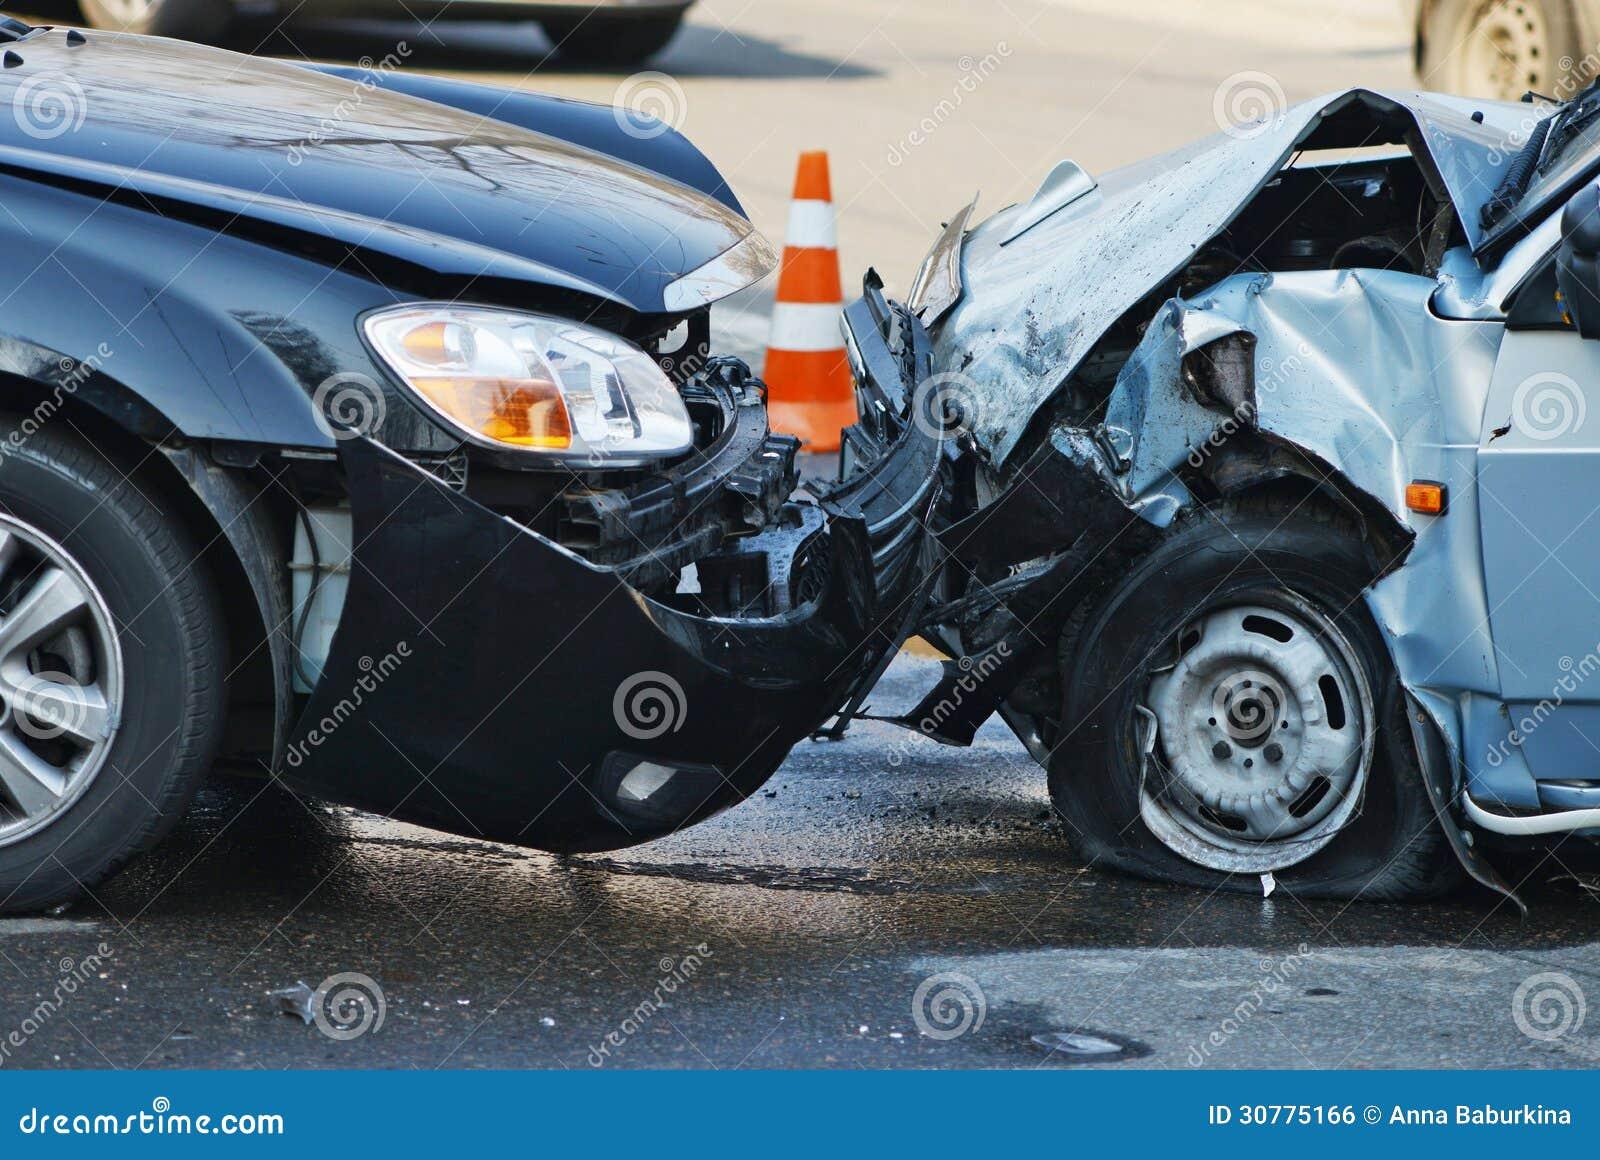 accident de voiture photo stock image du ivre perte 30775166. Black Bedroom Furniture Sets. Home Design Ideas